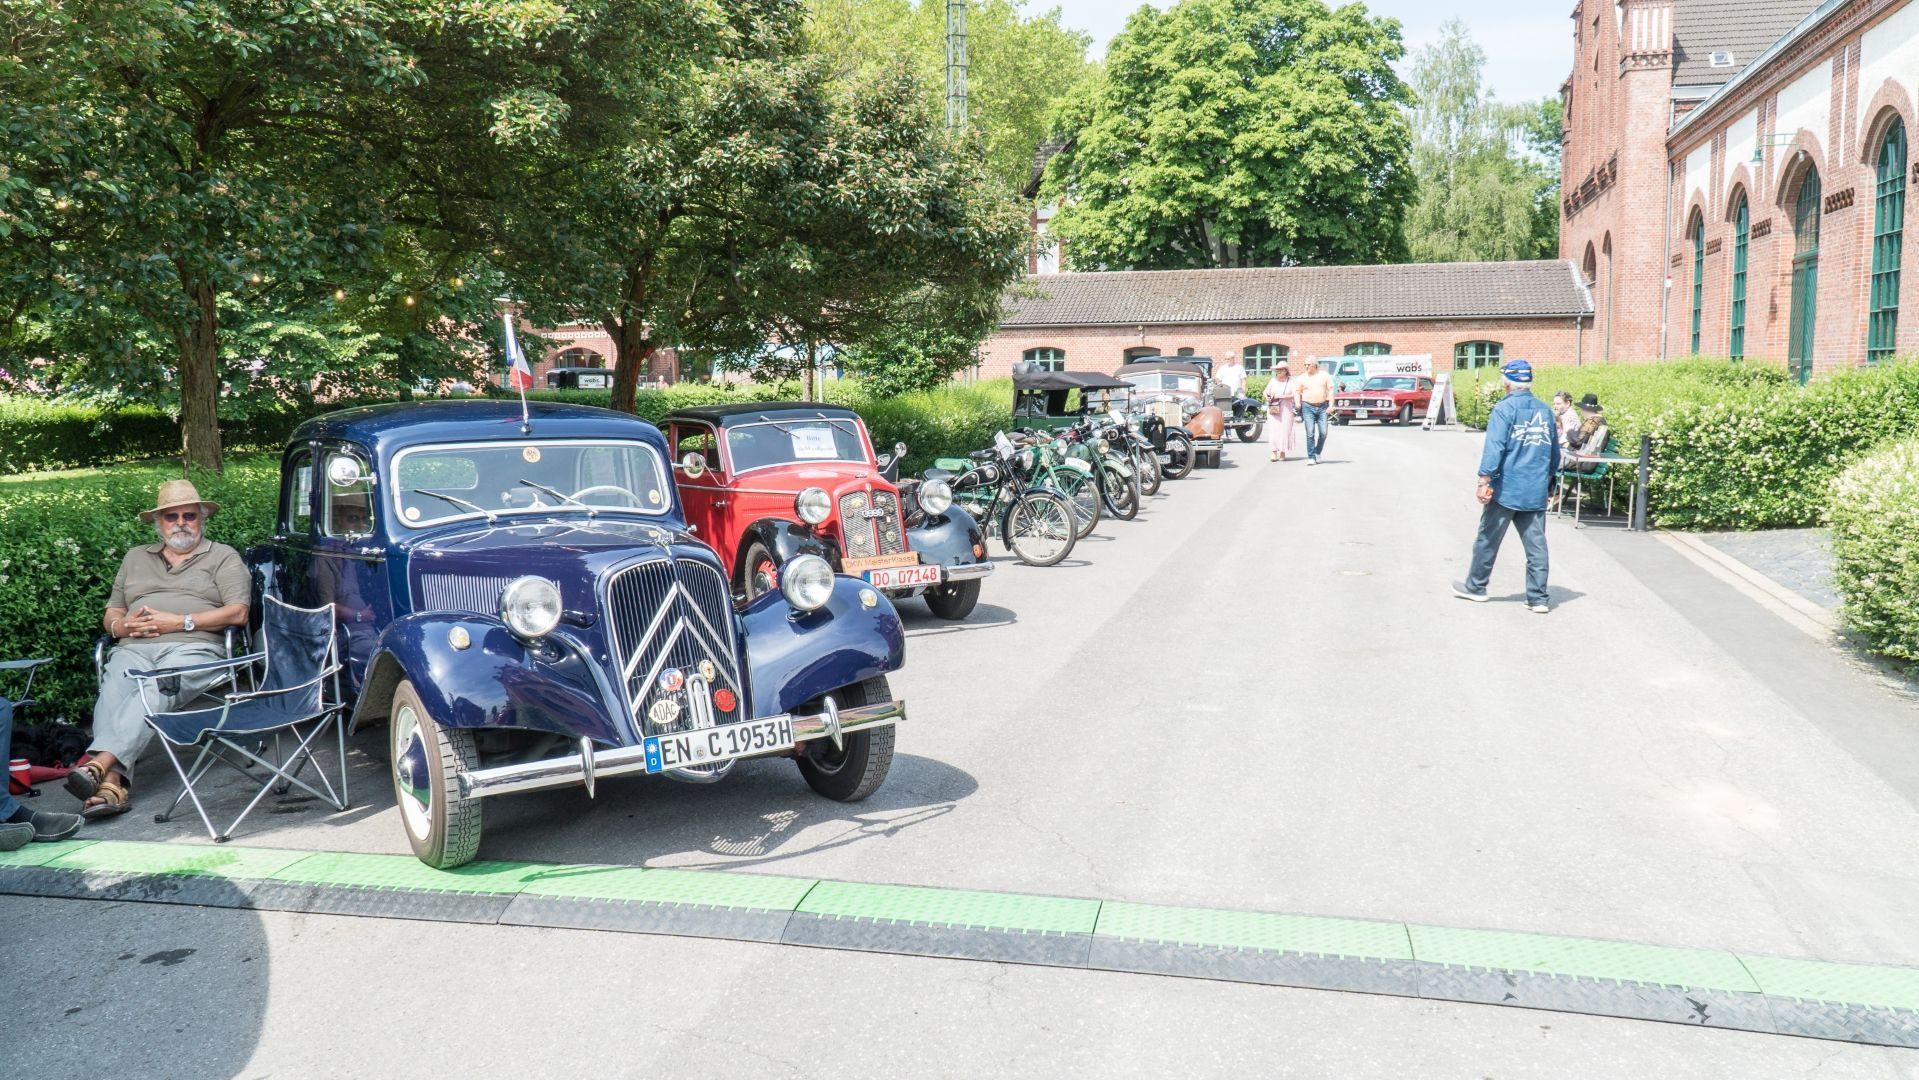 PARKPLÄTZE - Parkplätze - Anfahrt - Navi